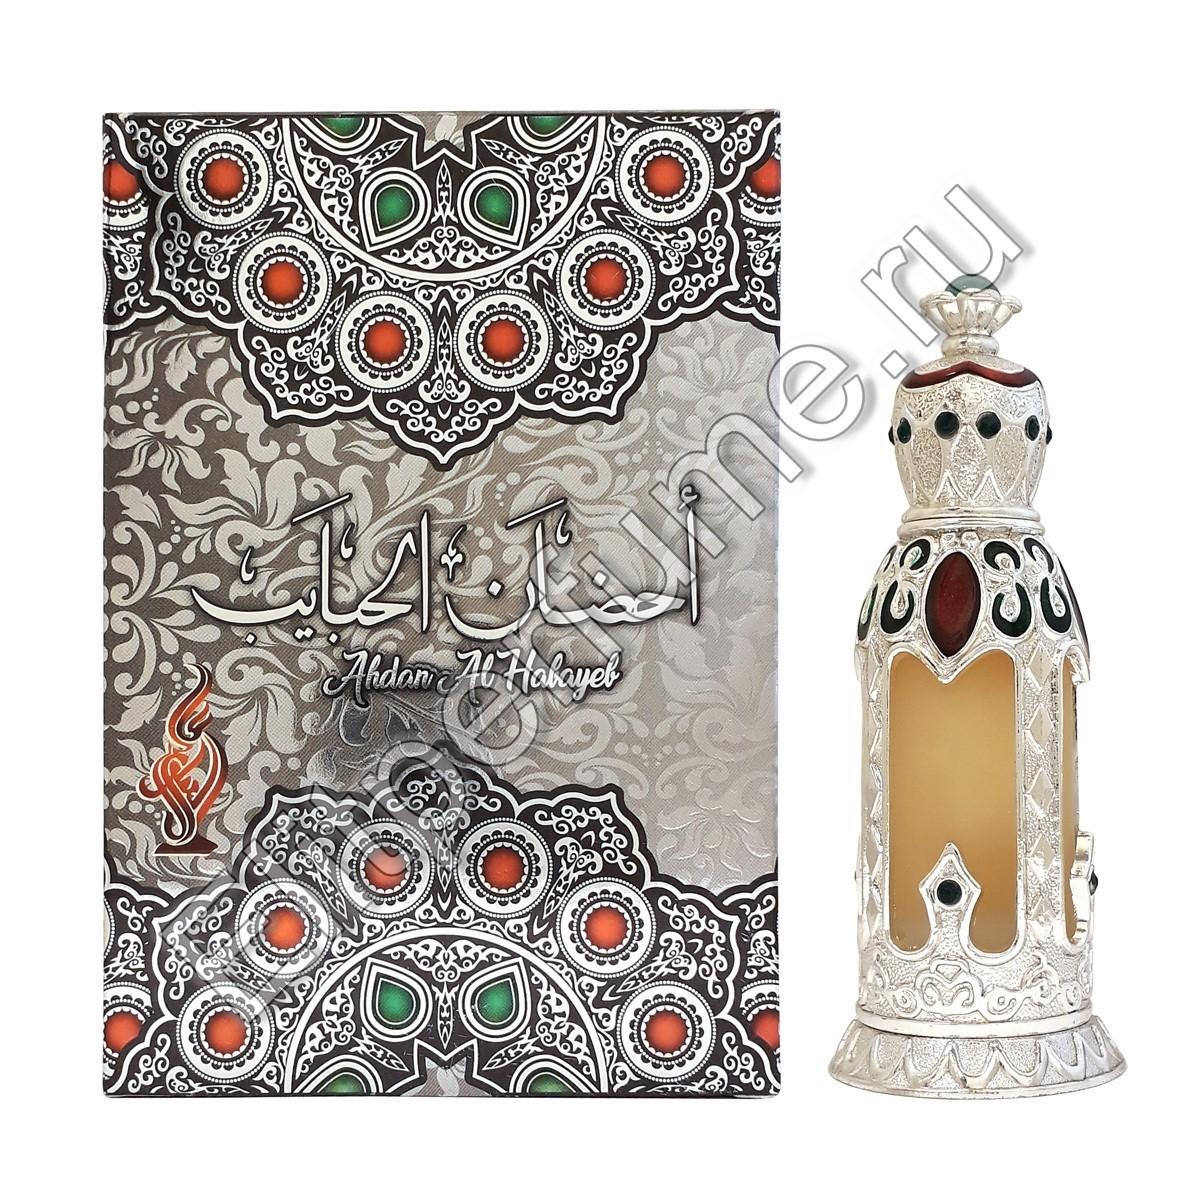 Ahdan al Habayeb / Ахдан аль Хабайб 18 мл арабские масляные духи от Халис Khalis Perfumes